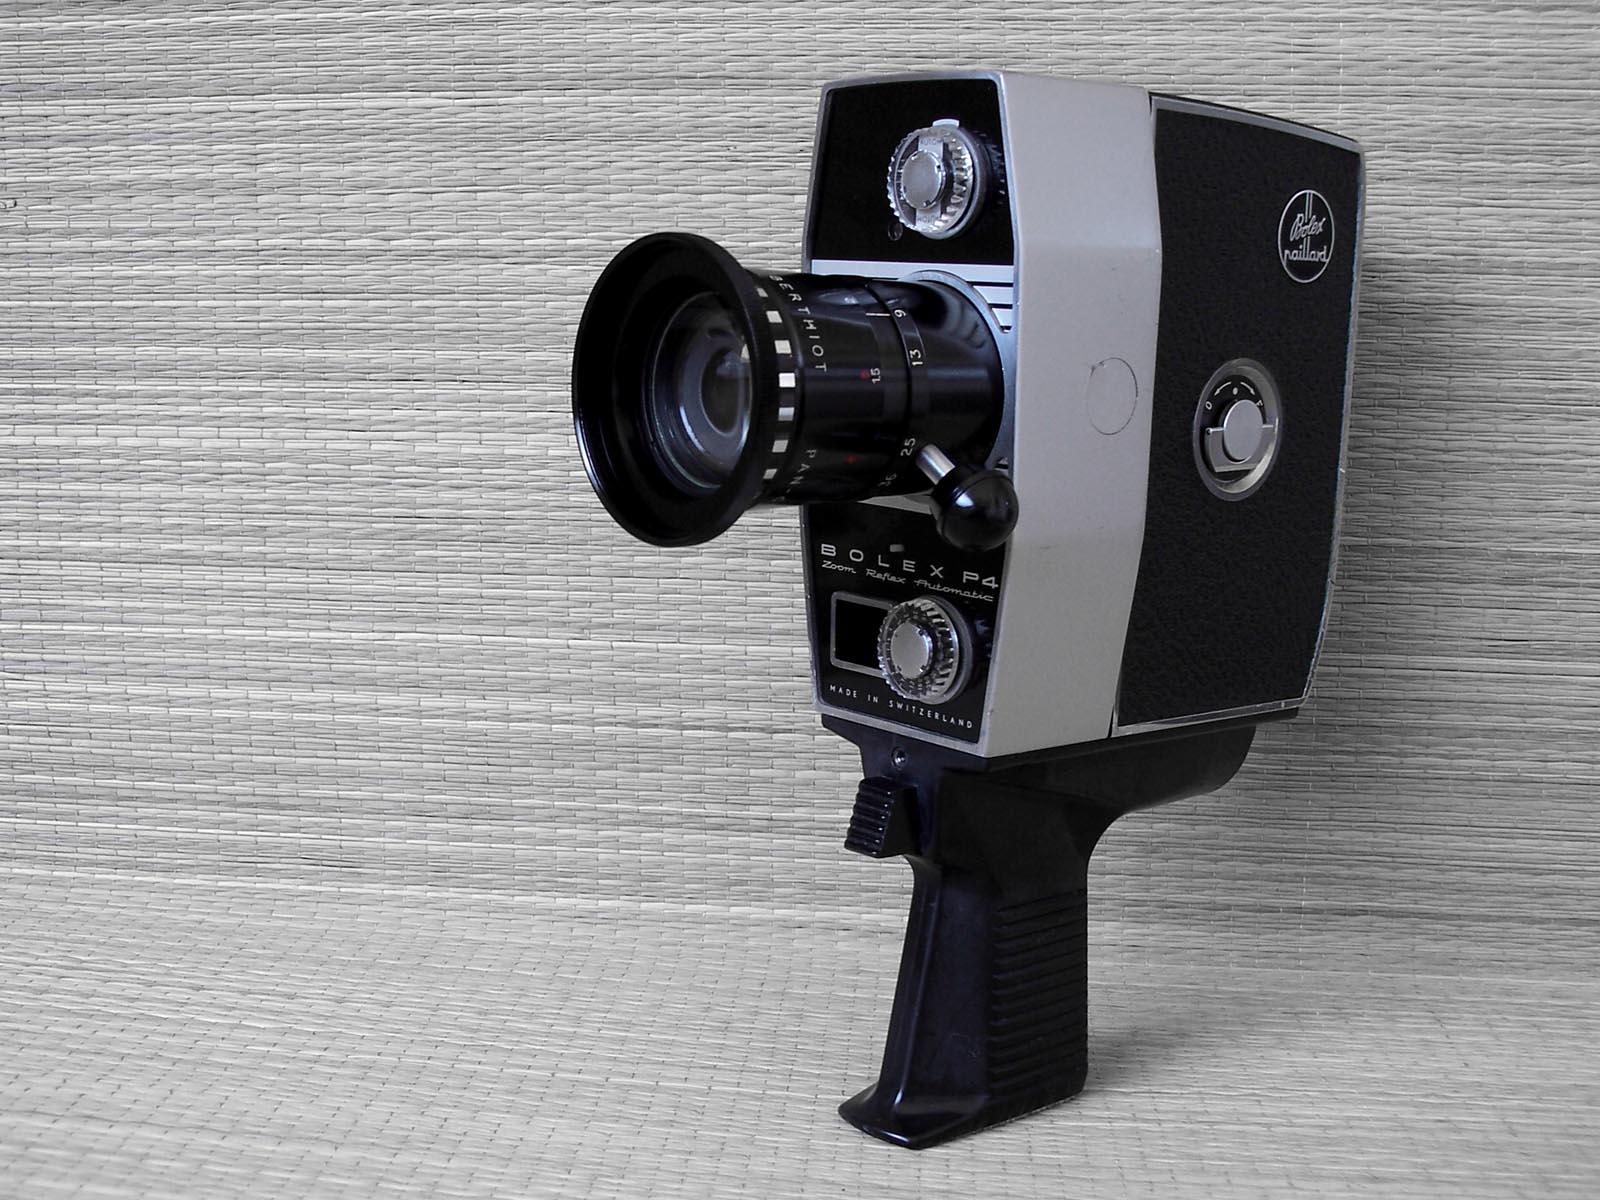 fotografia riflessiva bolex paillard p4 zoom reflex automatic 1965. Black Bedroom Furniture Sets. Home Design Ideas